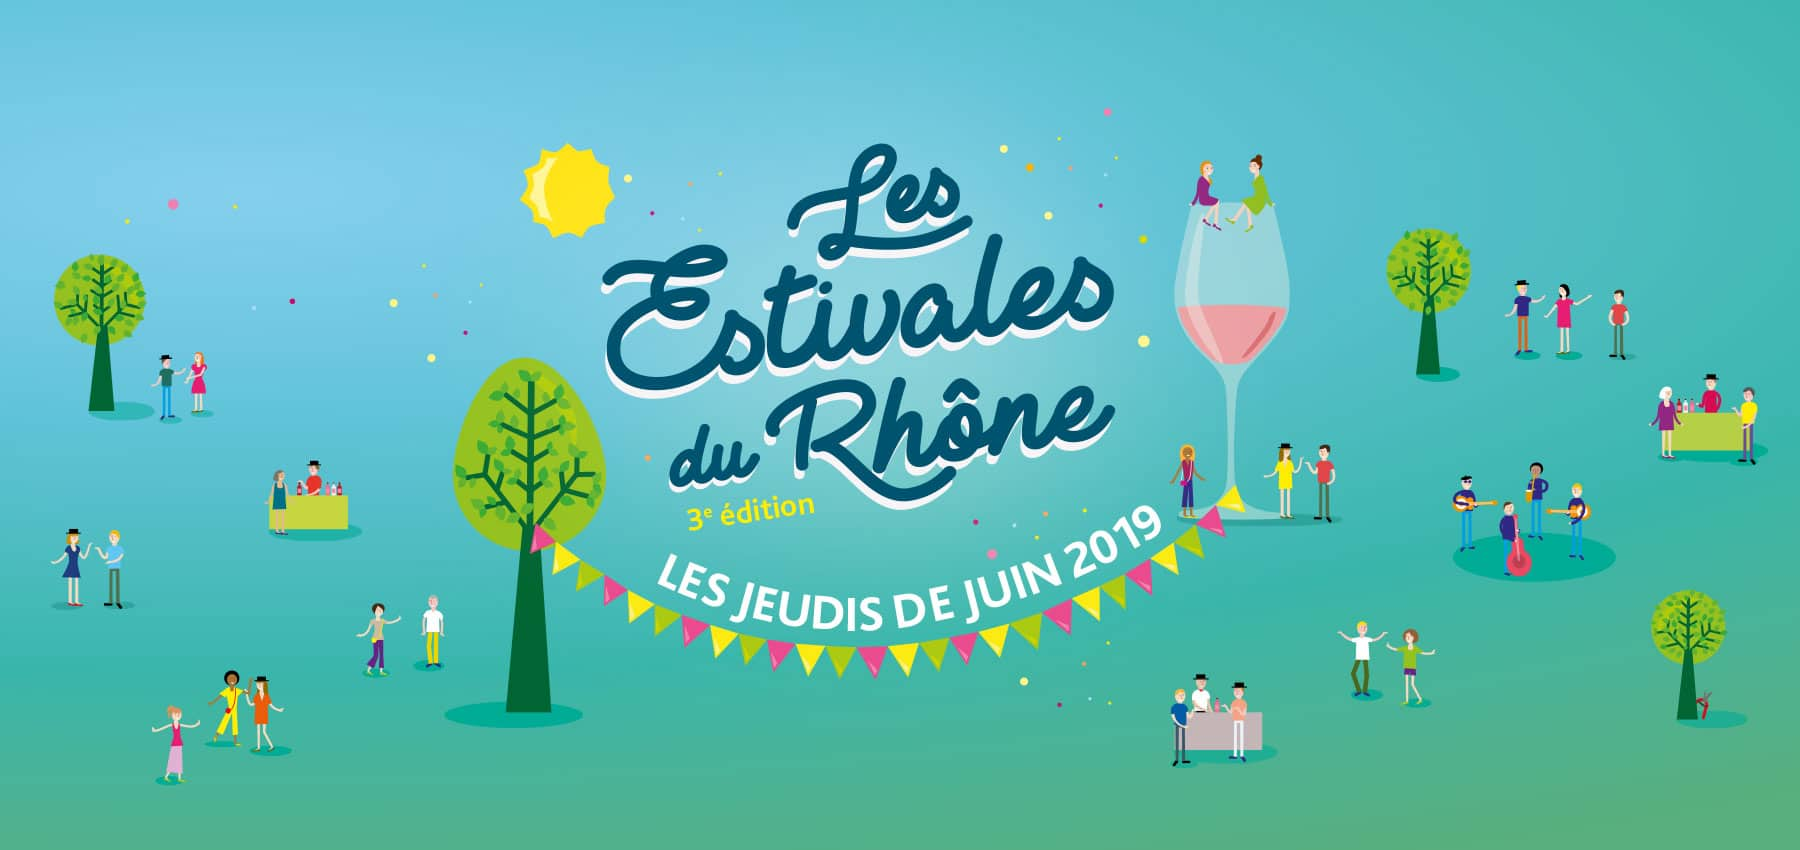 Estivales du Rhône Avignon 2019